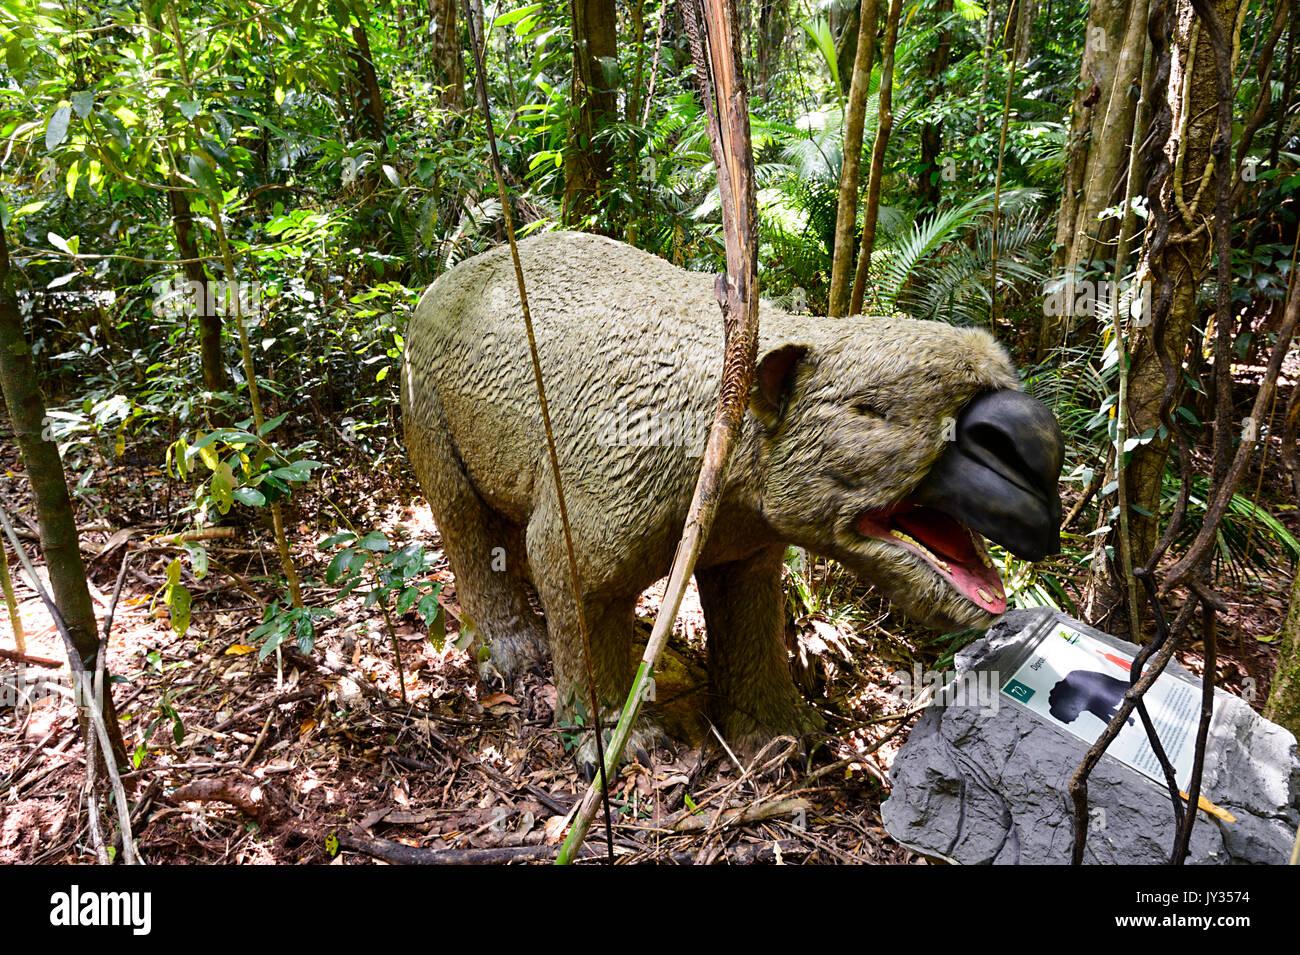 Giant Wombat (Diprotodon optatum), extinct Australian megafauna in the Jurassic Forest, Daintree Discovery Centre, QLD, Queensland, Australia - Stock Image